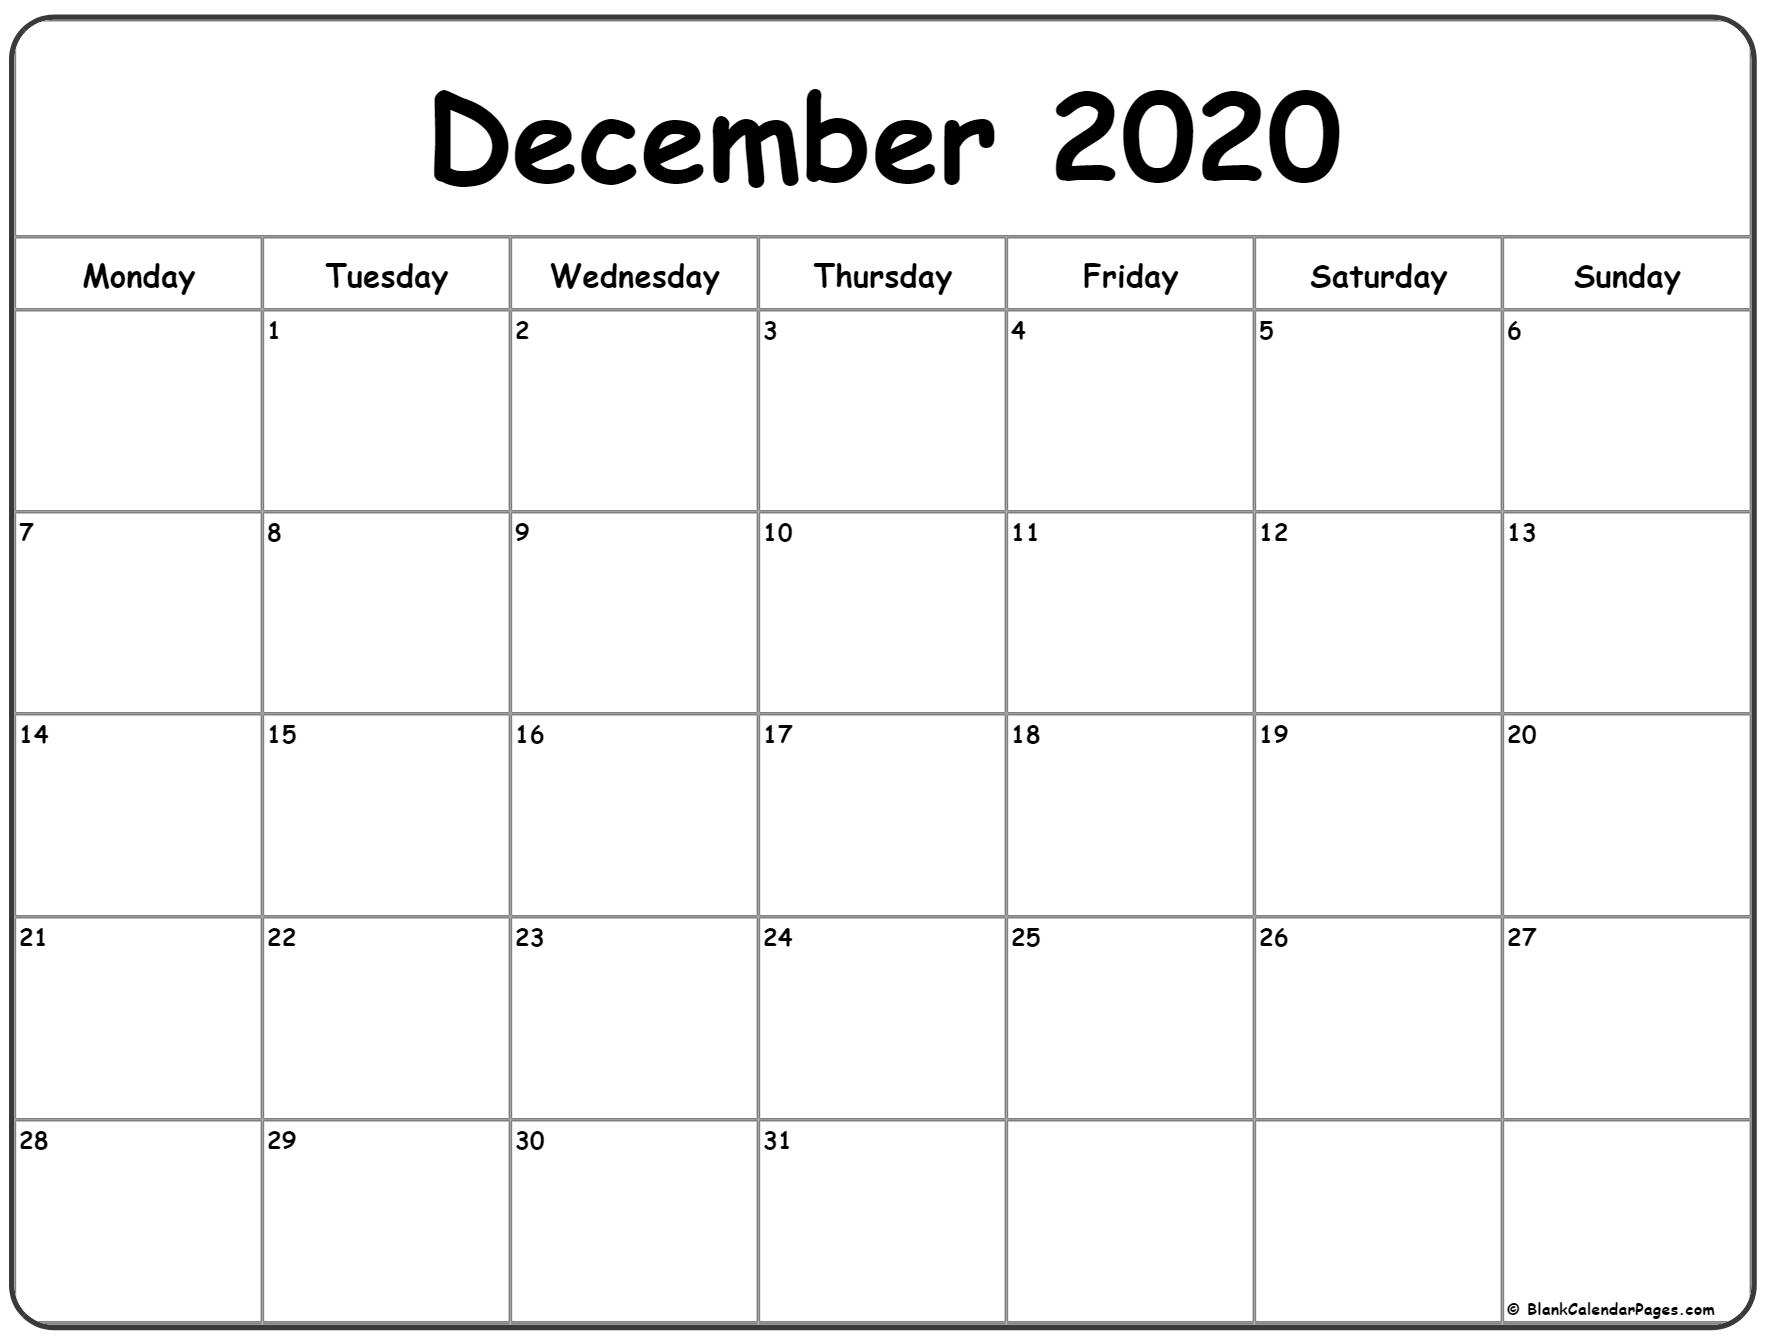 December 2020 Monday Calendar | Monday To Sunday